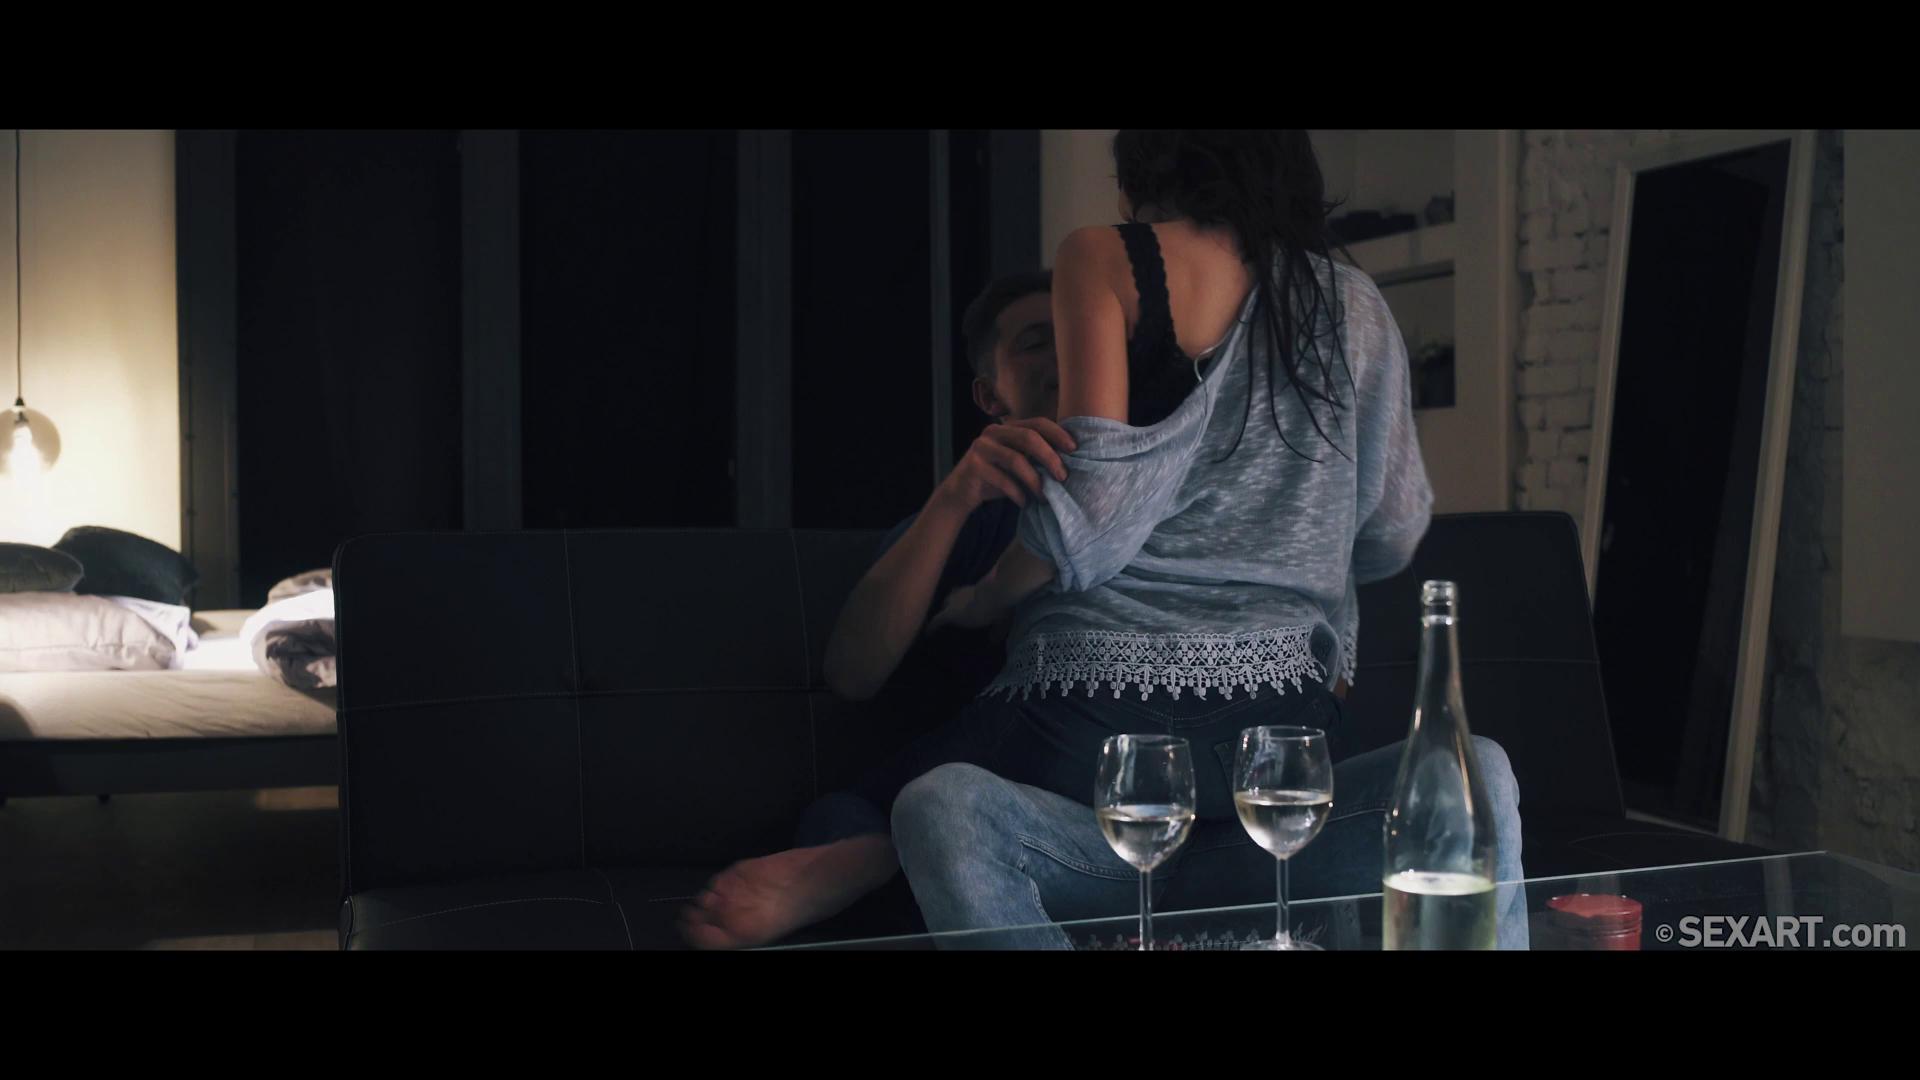 SexArt – Elena Vega Chasing Men Episode 3